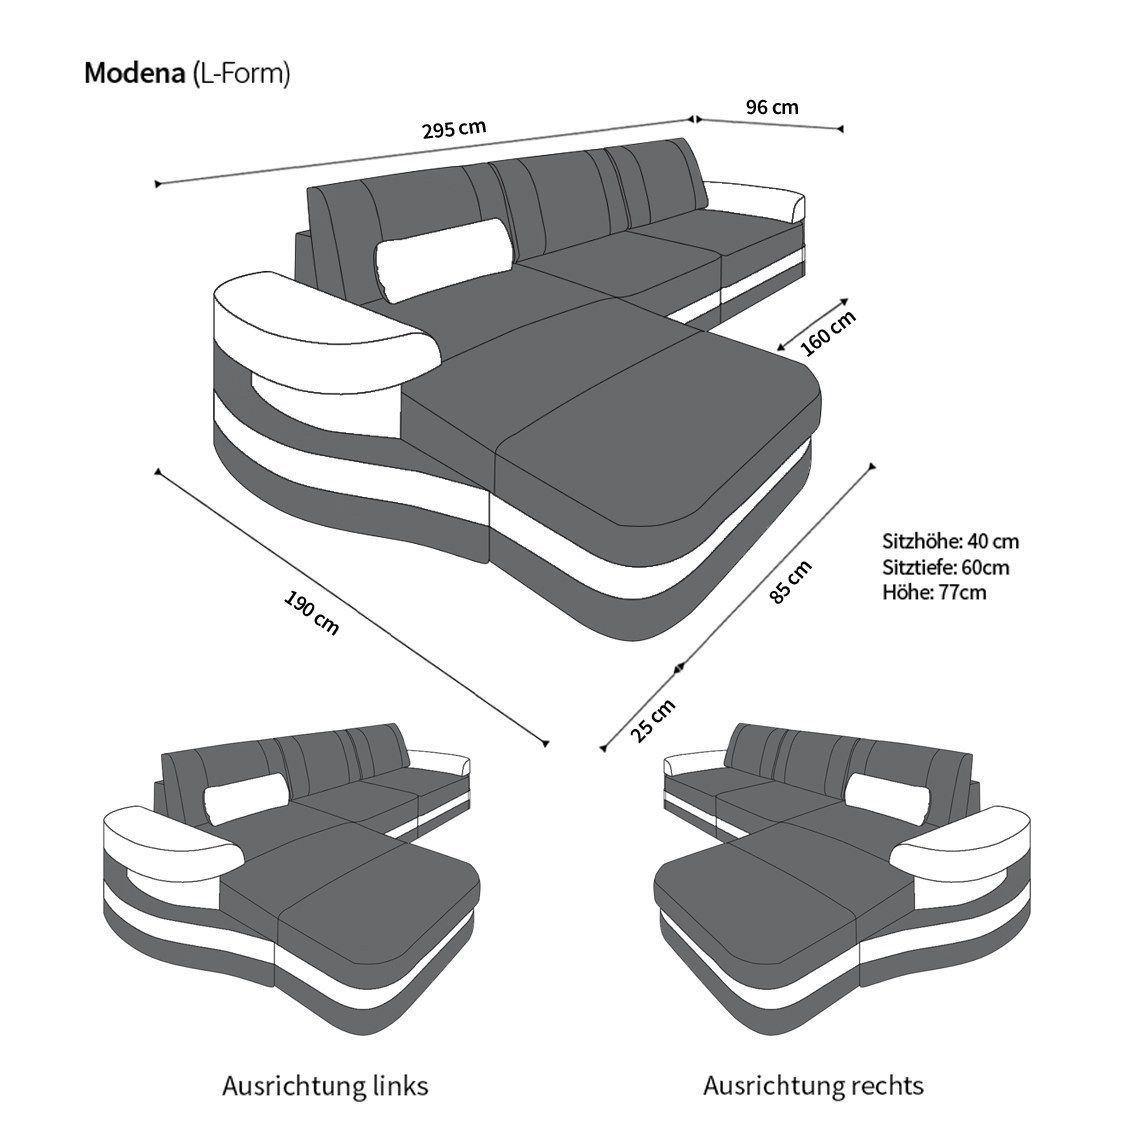 ledersofa modena in der l form als ecksofa mit farbe schwarz weiss. Black Bedroom Furniture Sets. Home Design Ideas